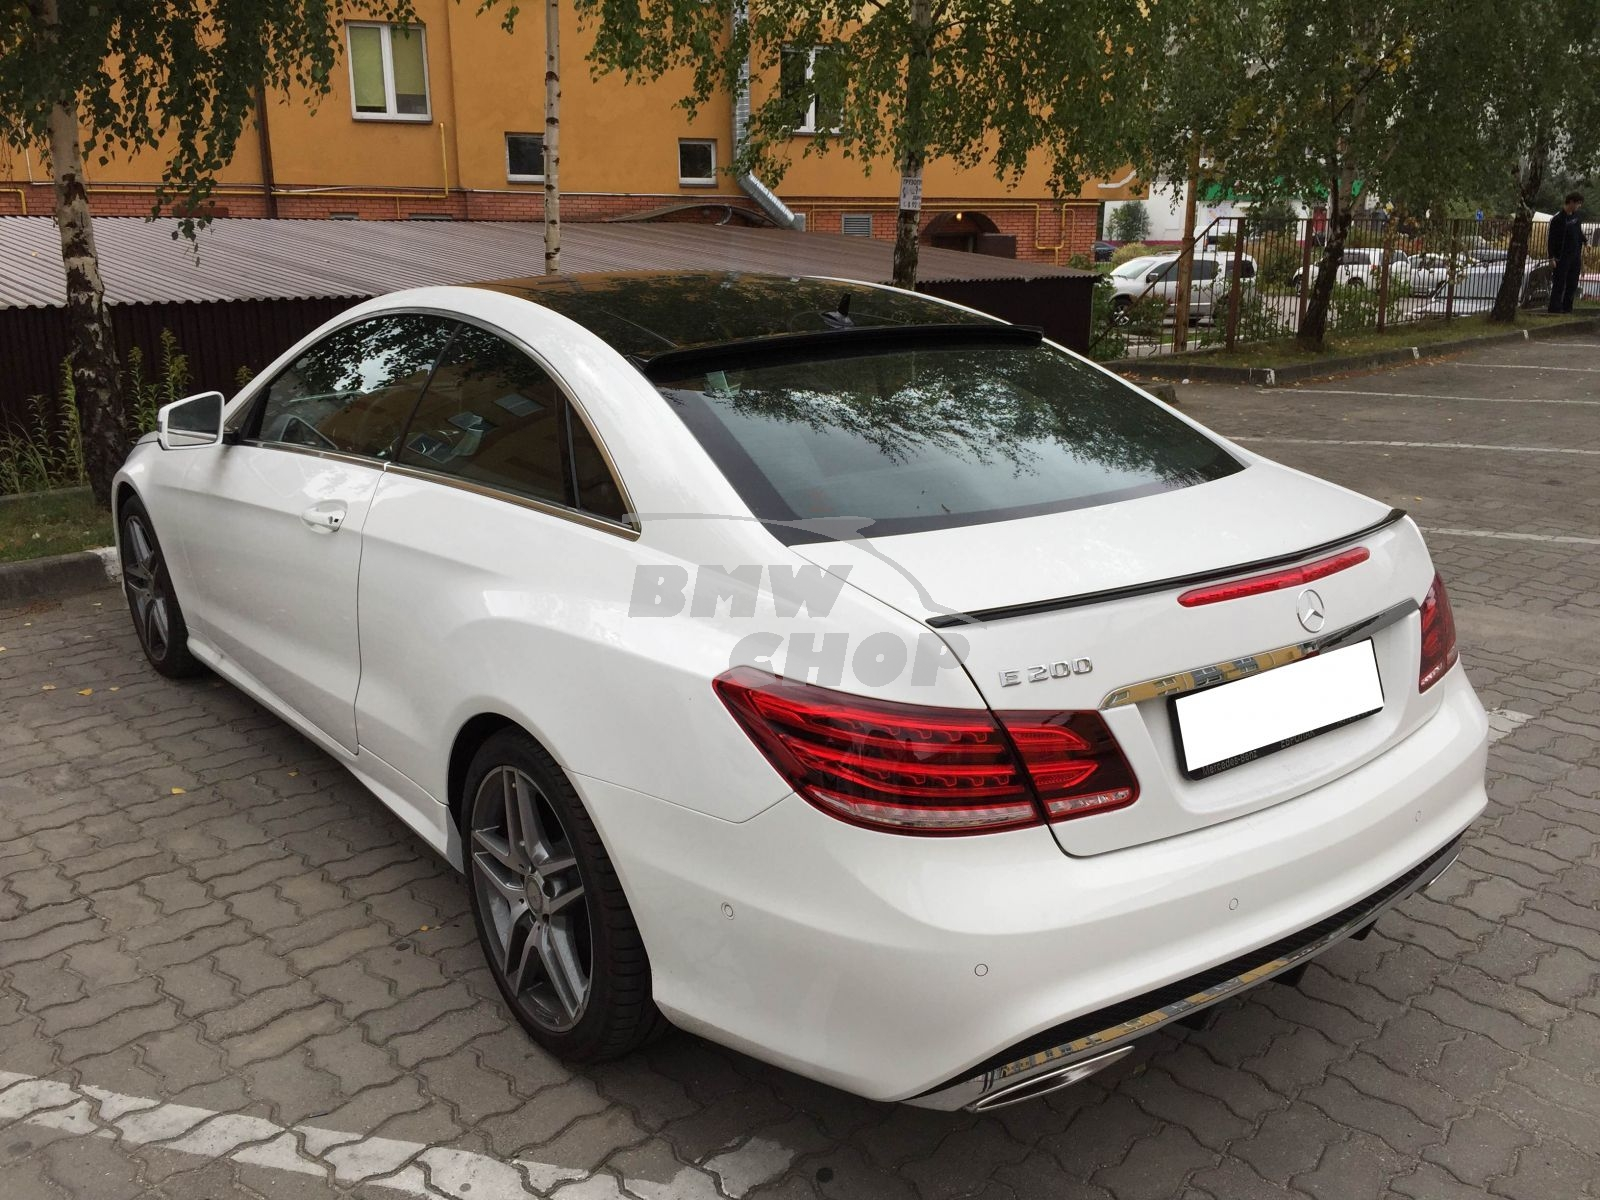 Painted Mercedes Benz C207 E Class 2dr Coupe Rear Window